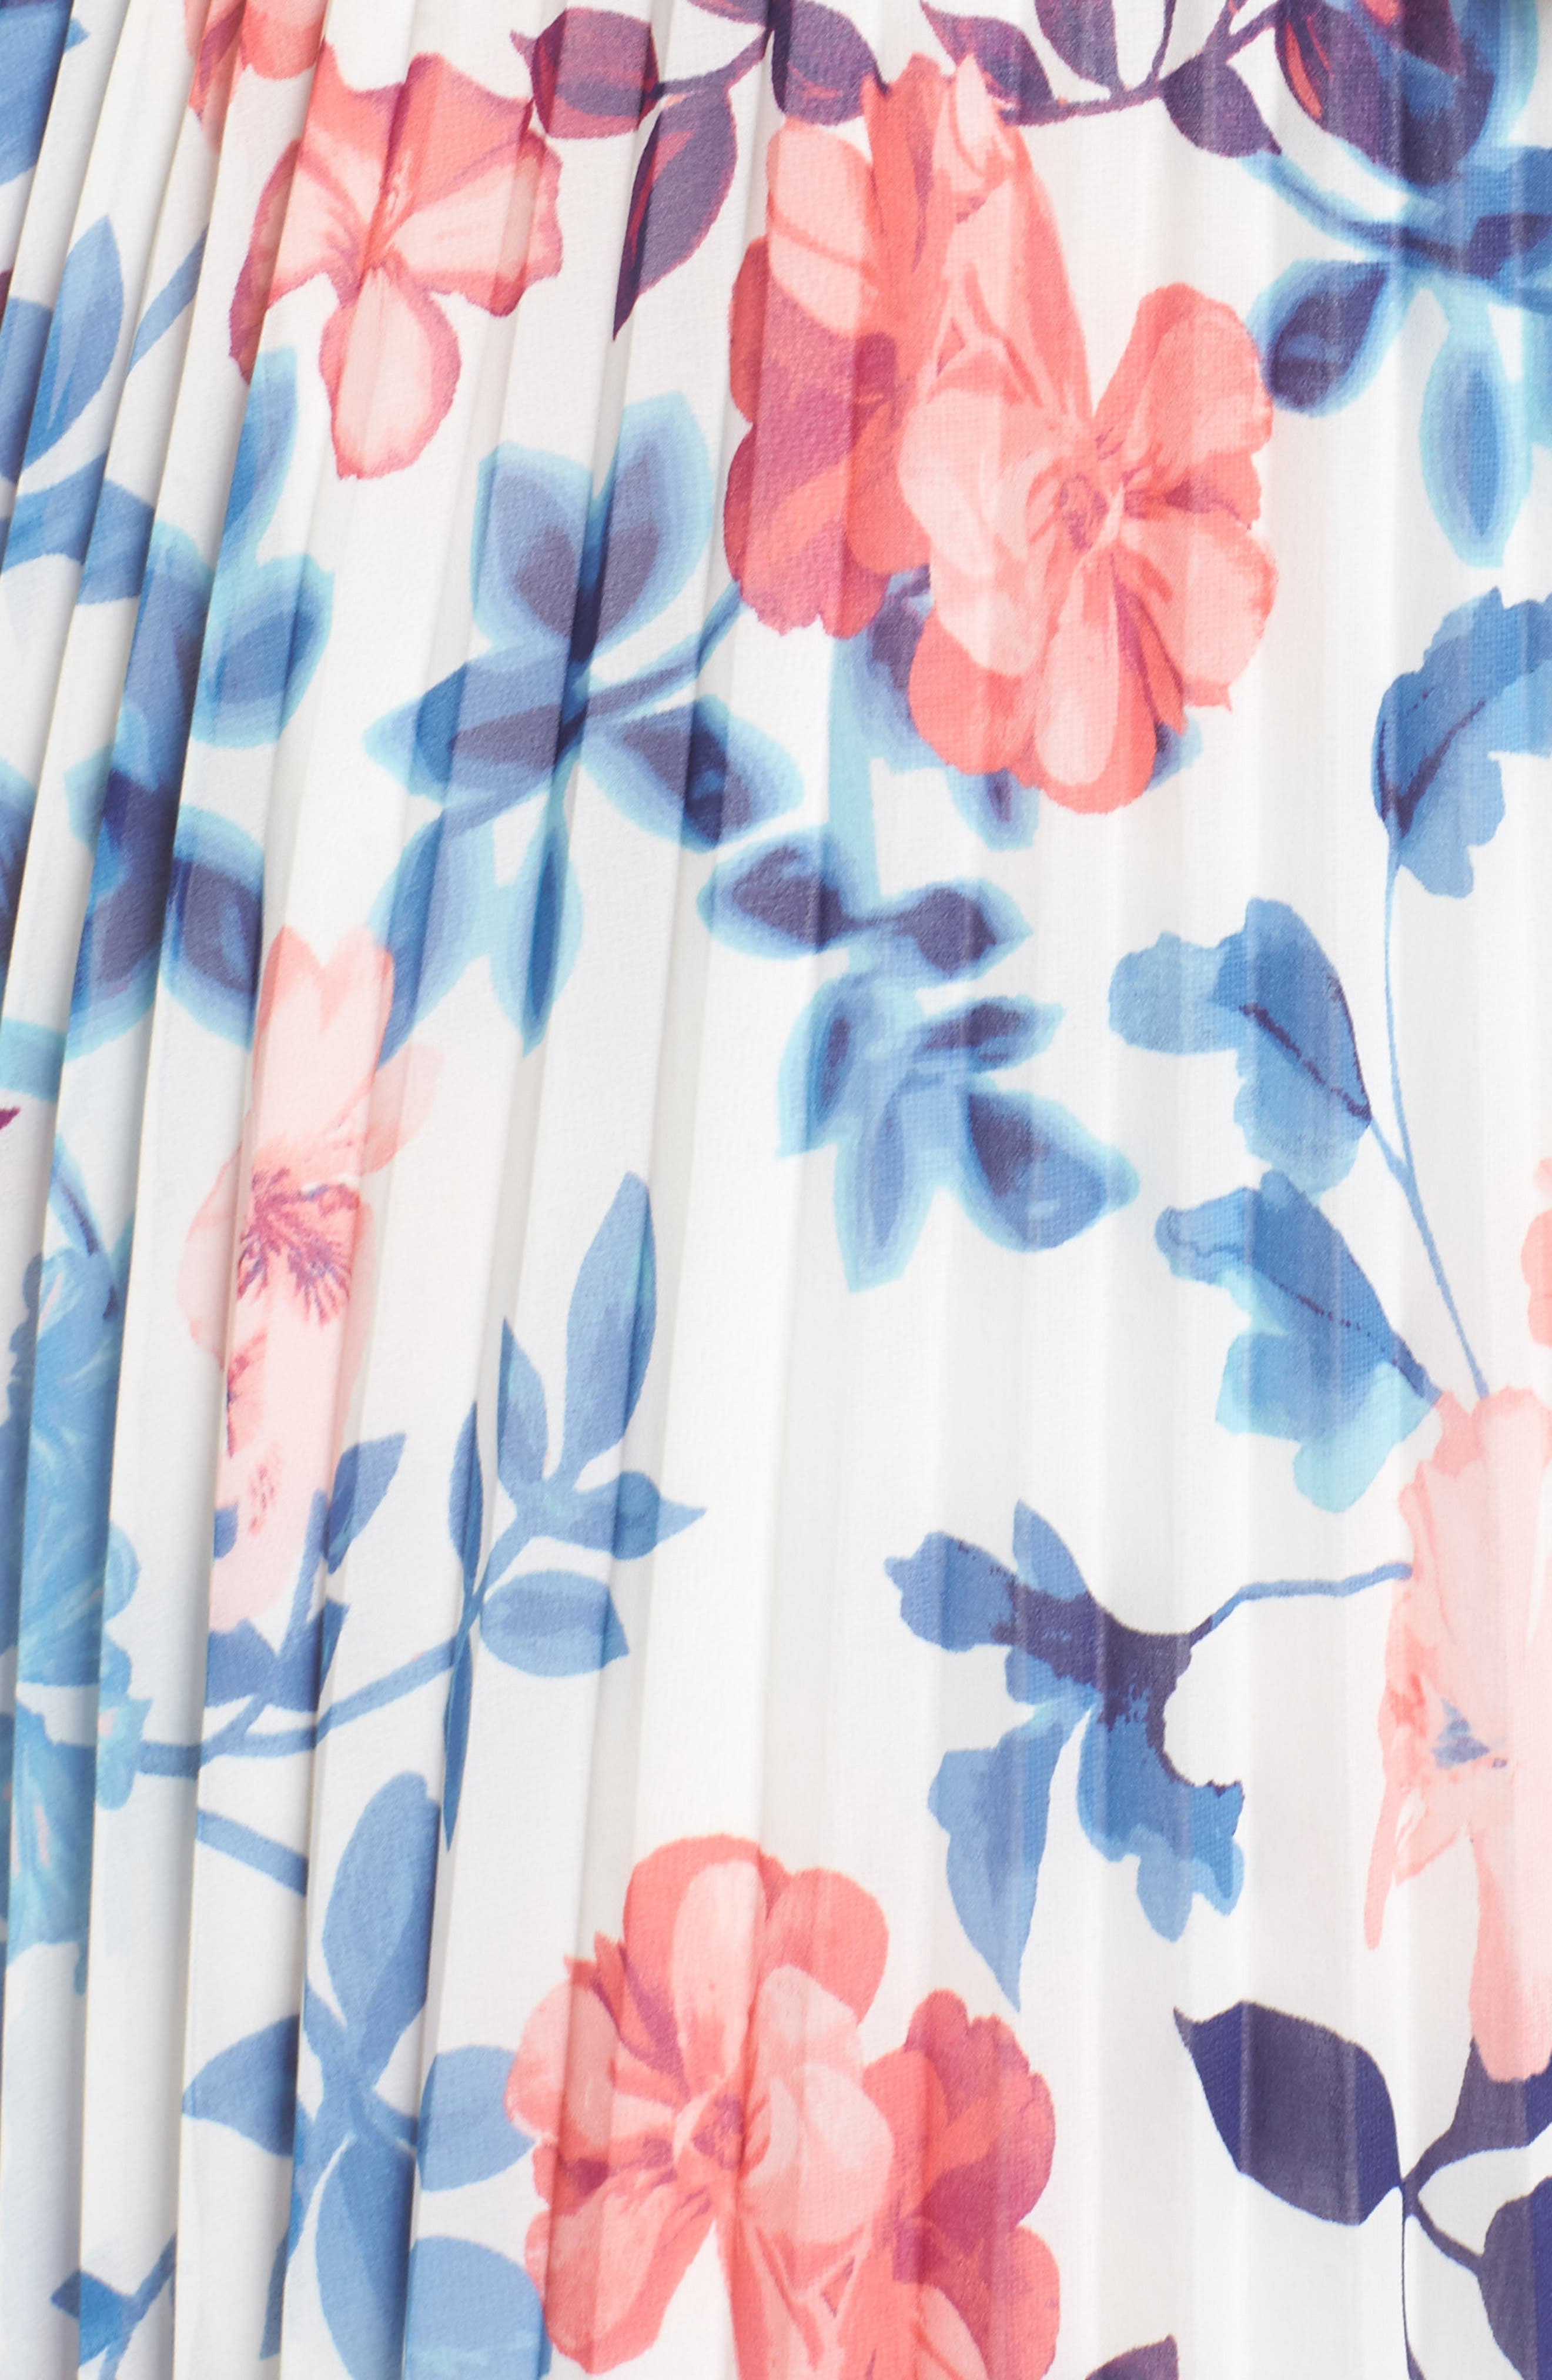 Off the Shoulder Maxi Dress,                             Alternate thumbnail 5, color,                             Ivory Blue